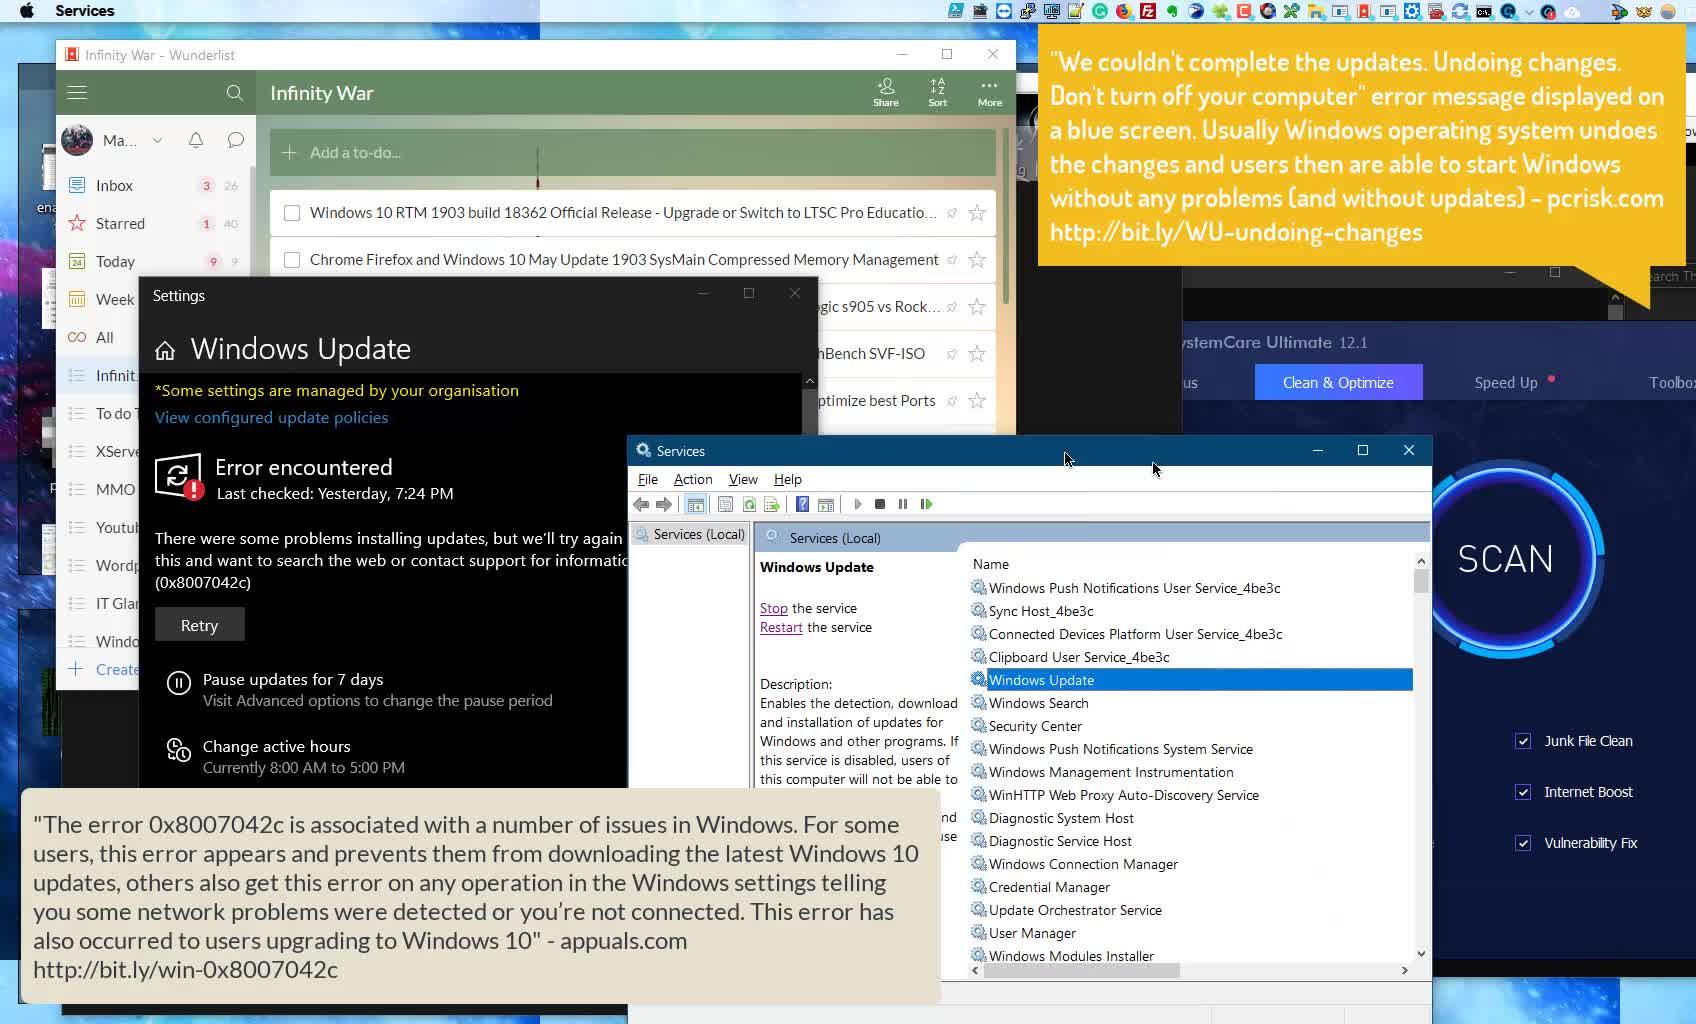 Windows 10 RTM 1903 Official Release Offline Upgrade troubleshoot BSOD reinstall Drivers Software | Windows 10 Server 2019